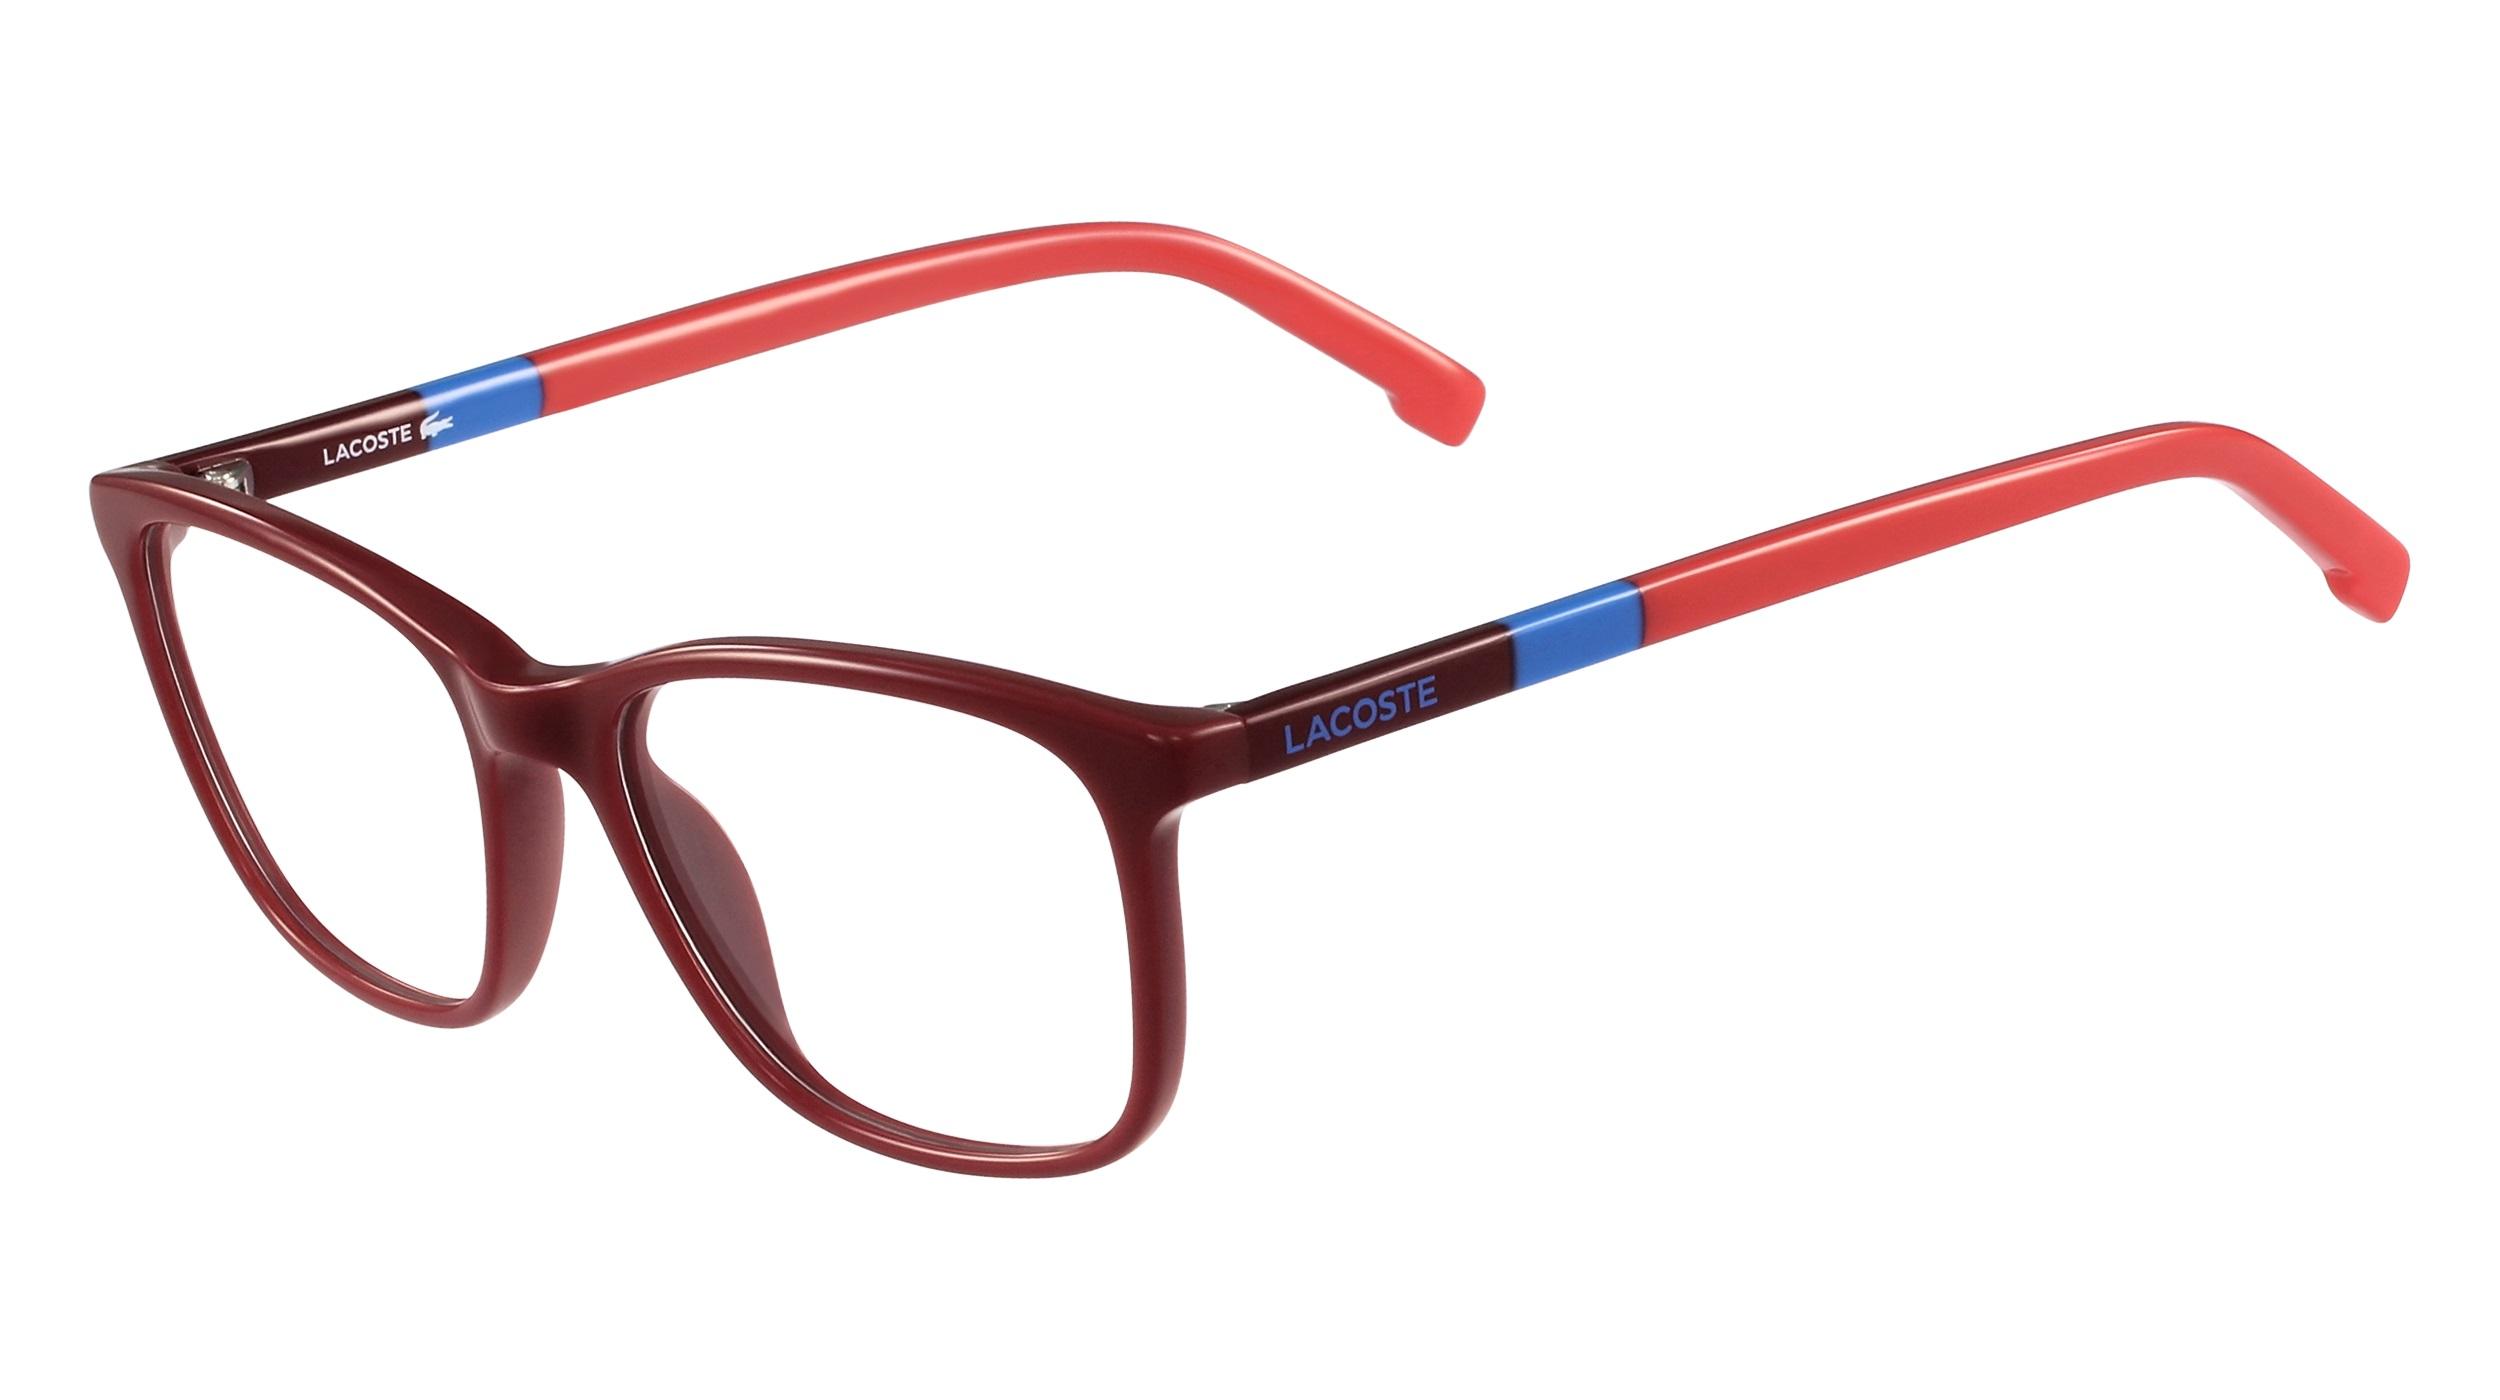 0bc76a69bee0c Eyewear for Kids - Optiwow